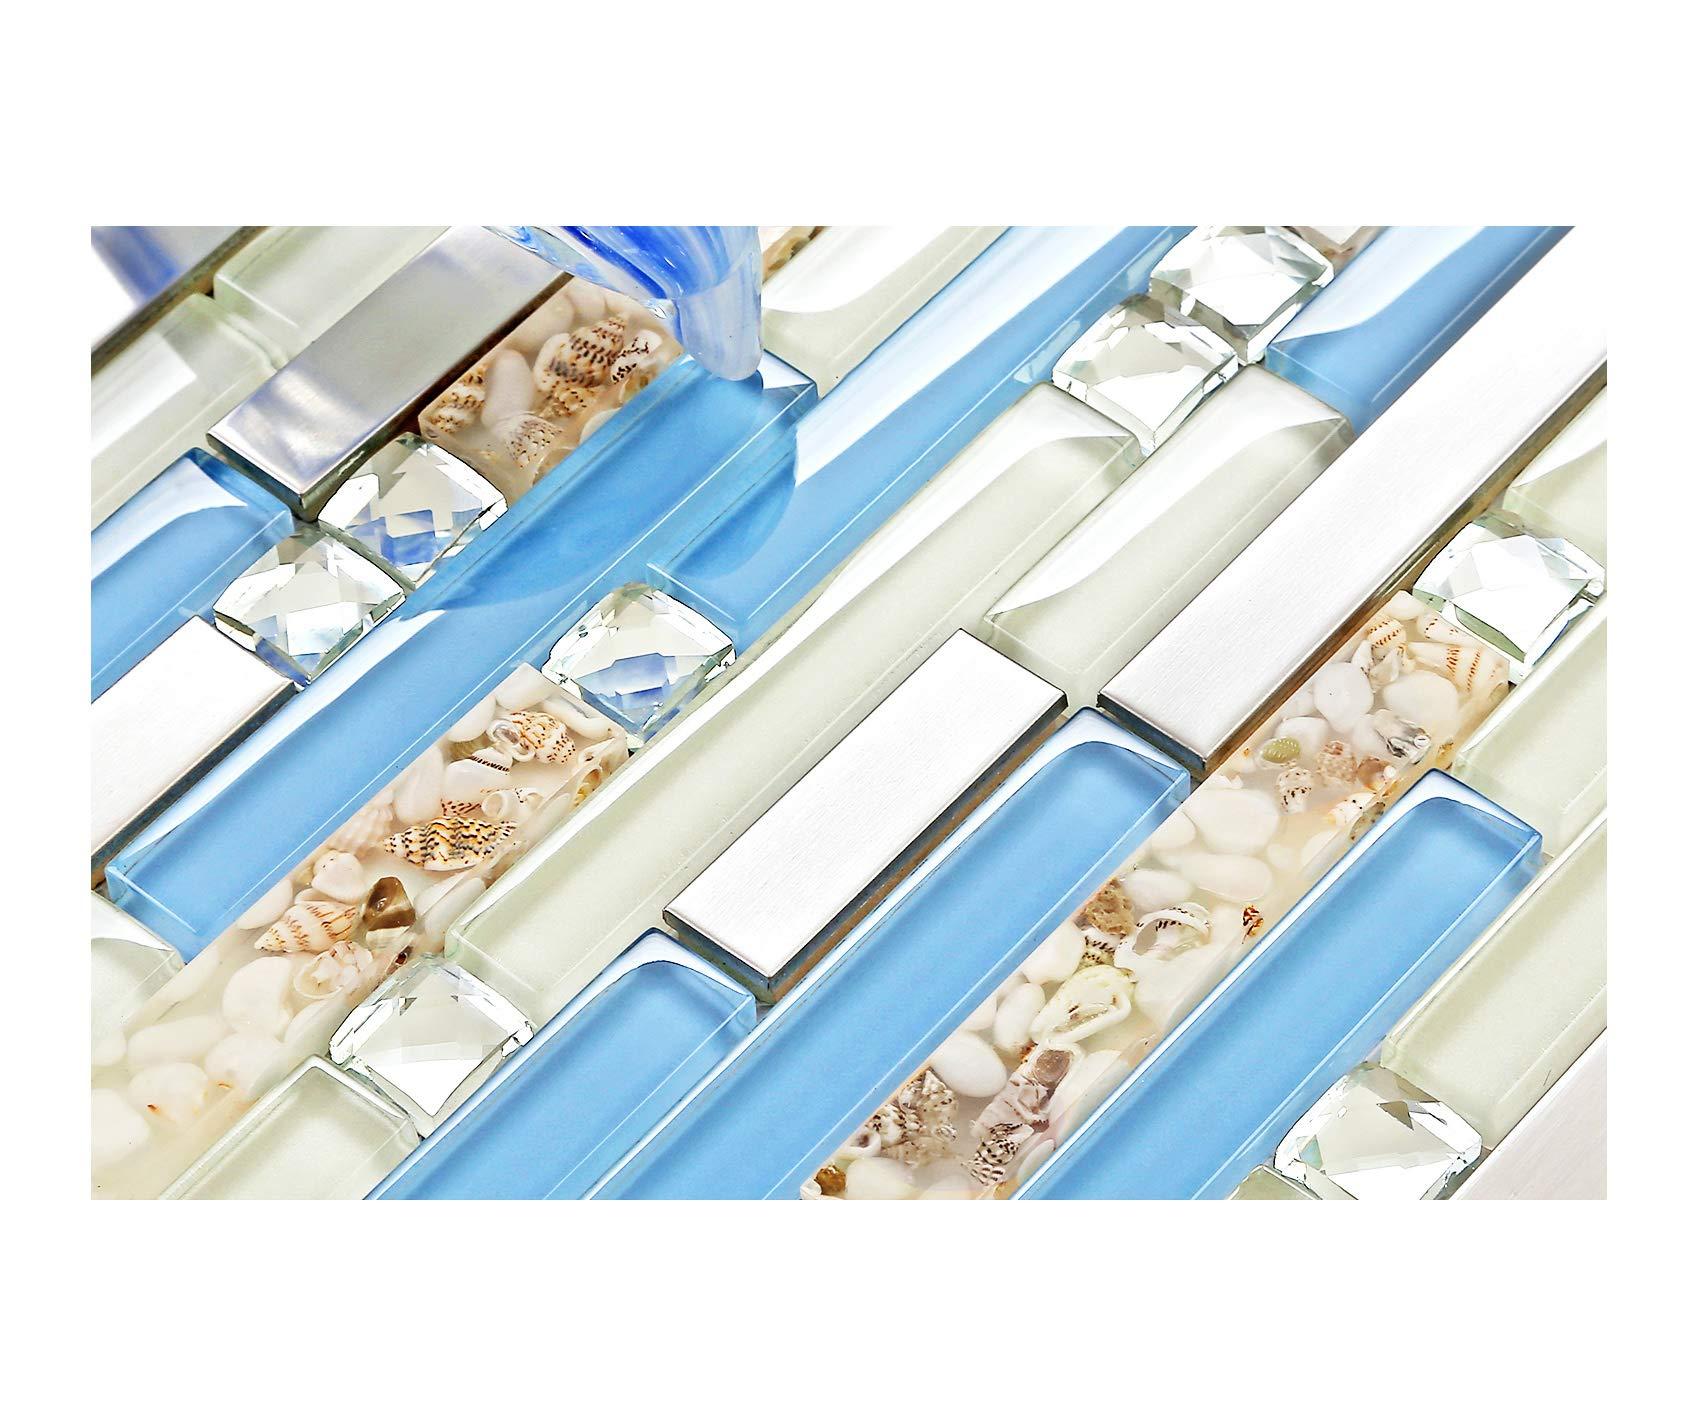 TST Glass Inner Conch Tile Beach Style Blue Cream White Brushed Steel Art Mosaic Kitchen Backsplash Bath Decor TSTNB06 (1 Sample 12x12 Inches) by BLUJELLYFISH